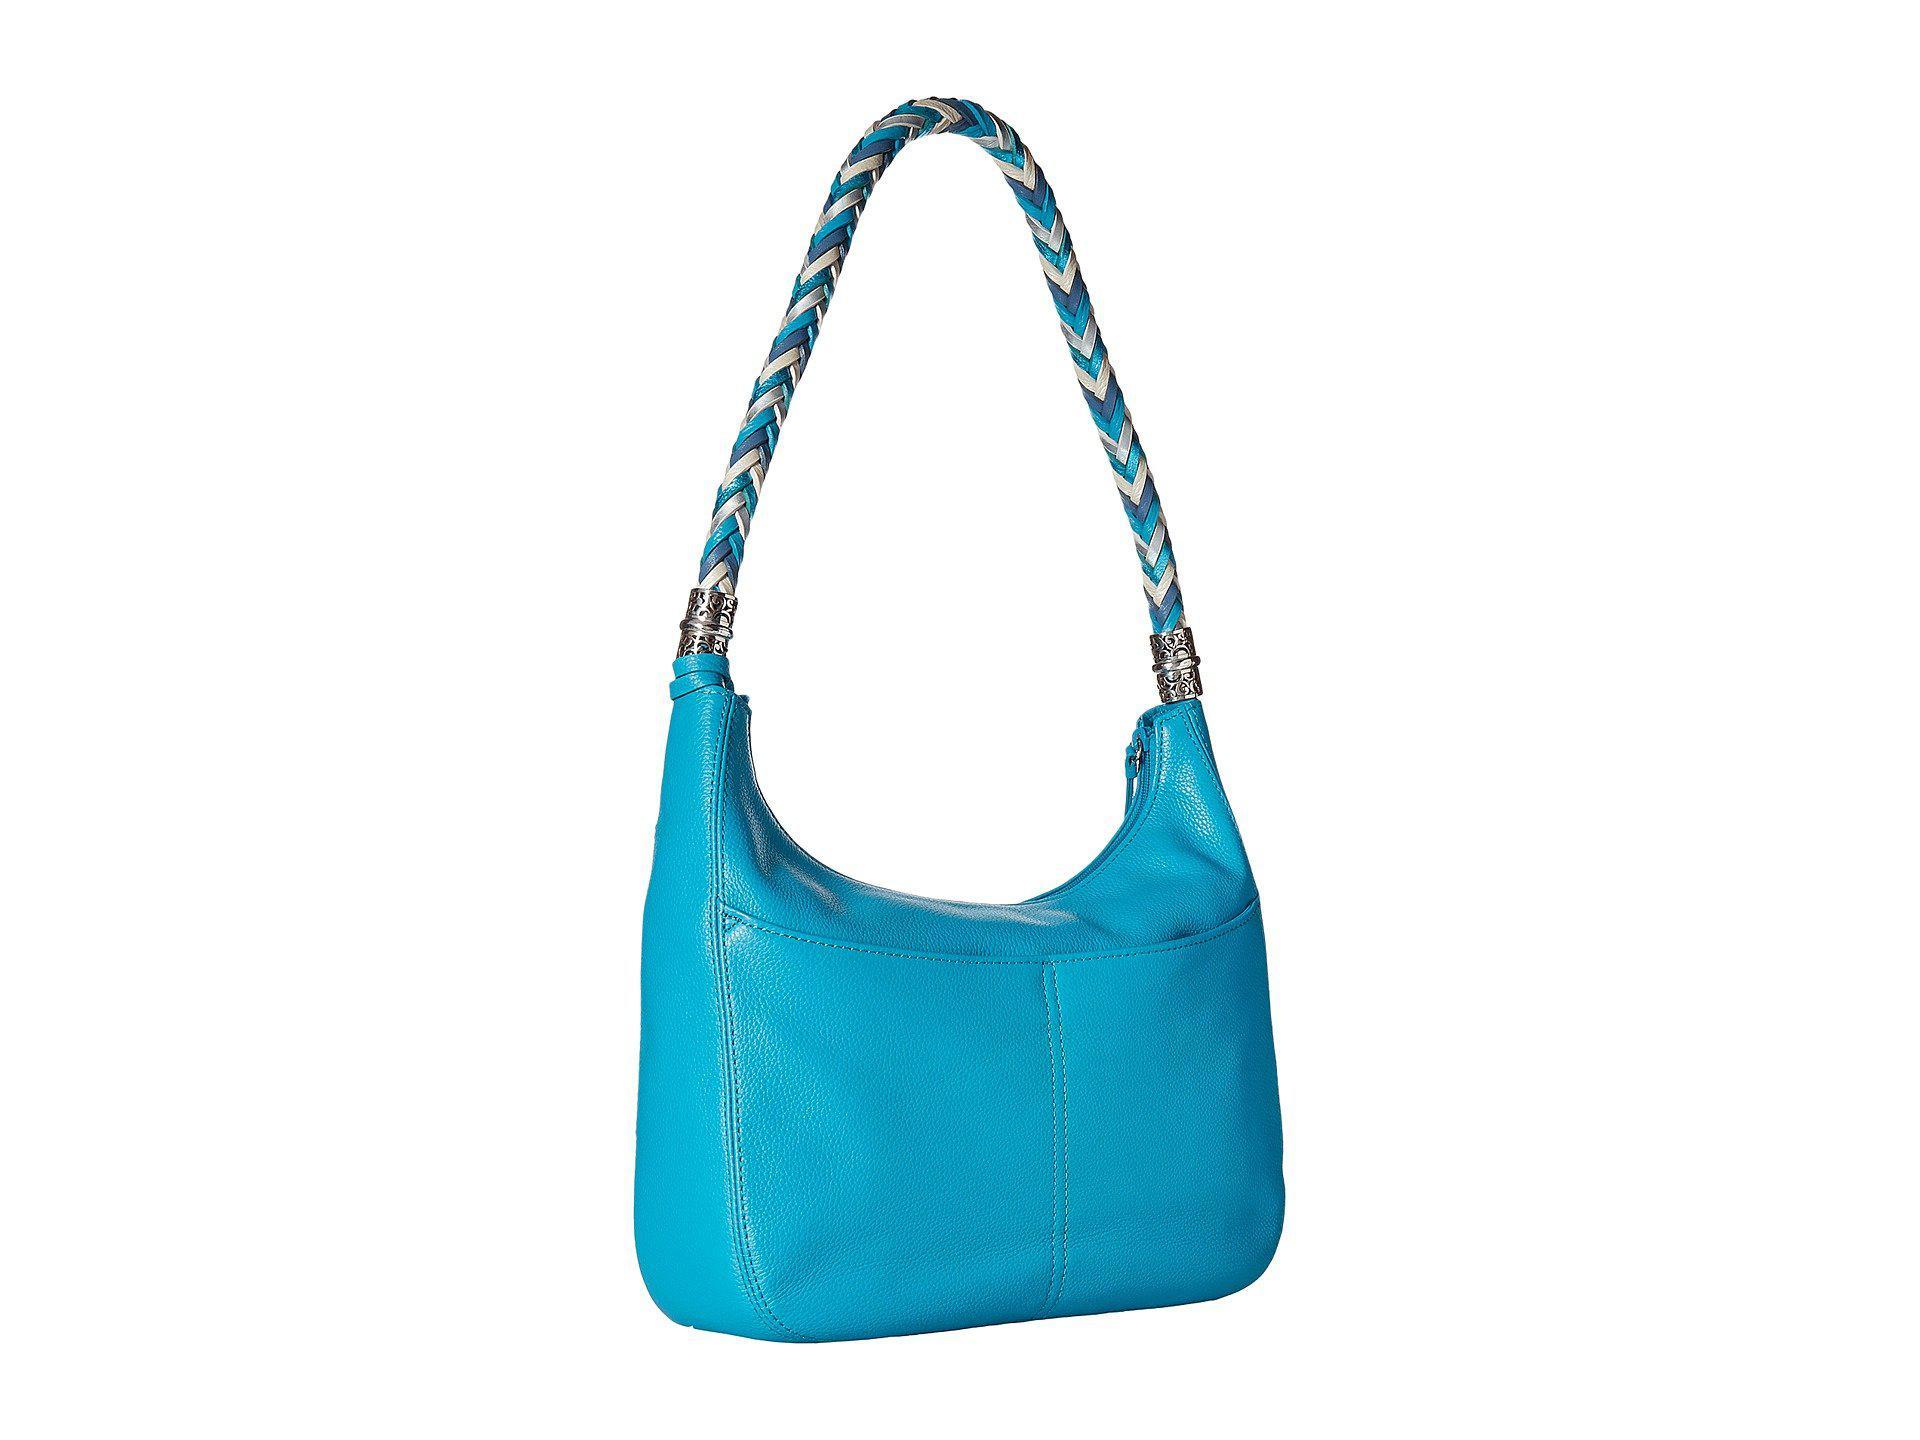 36e1eaf67489 Lyst - Brighton Barbados Ziptop Hobo in Blue